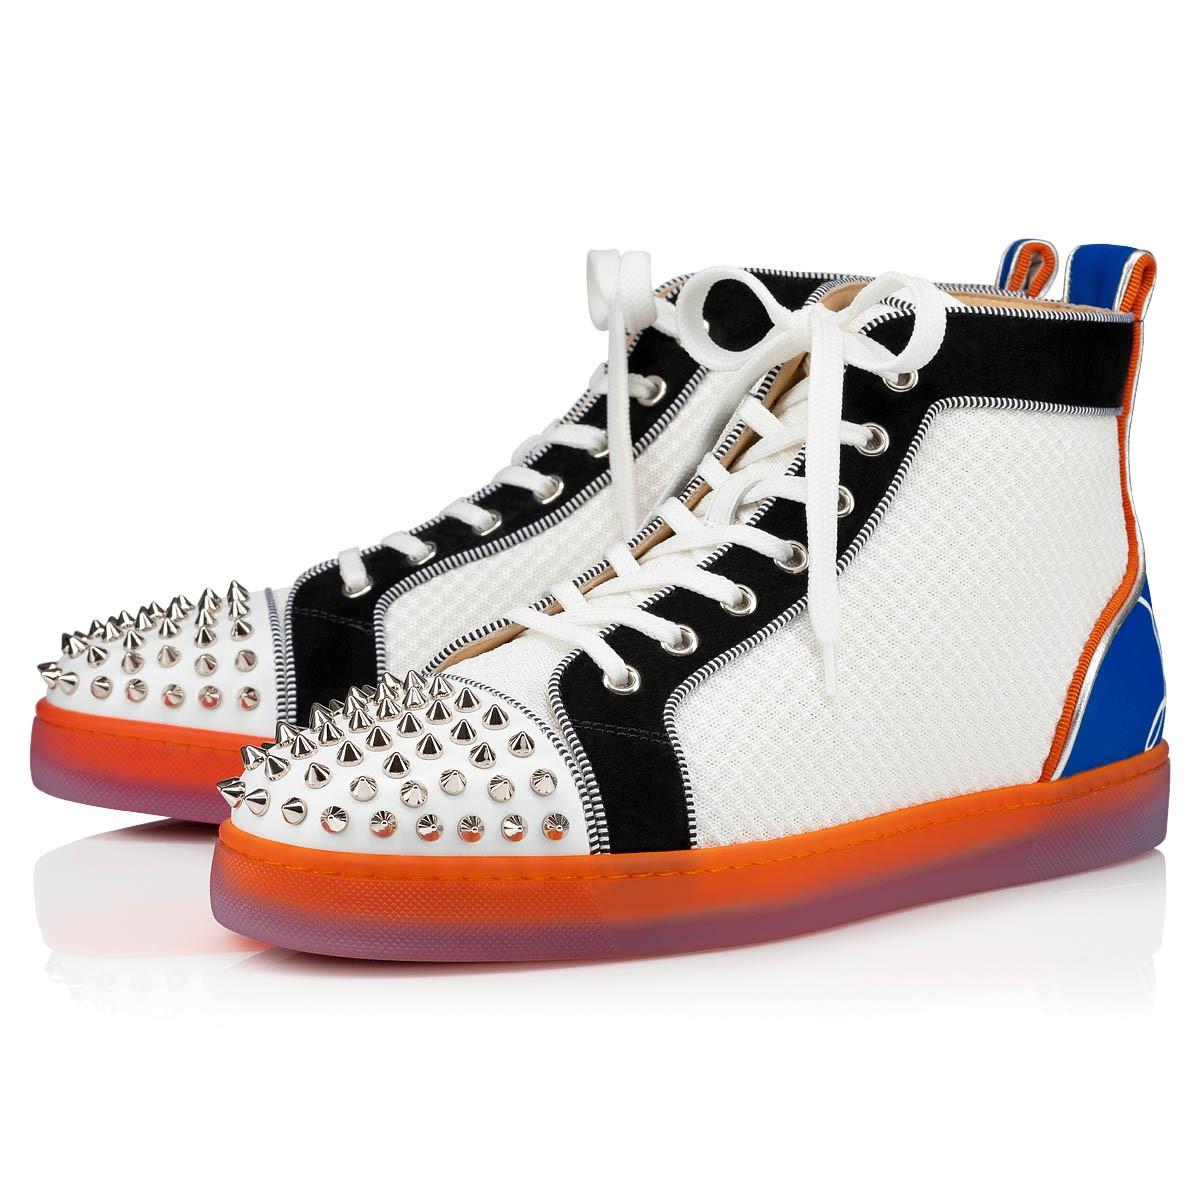 Shoes - Fun Lou Spikes Flat - Christian Louboutin